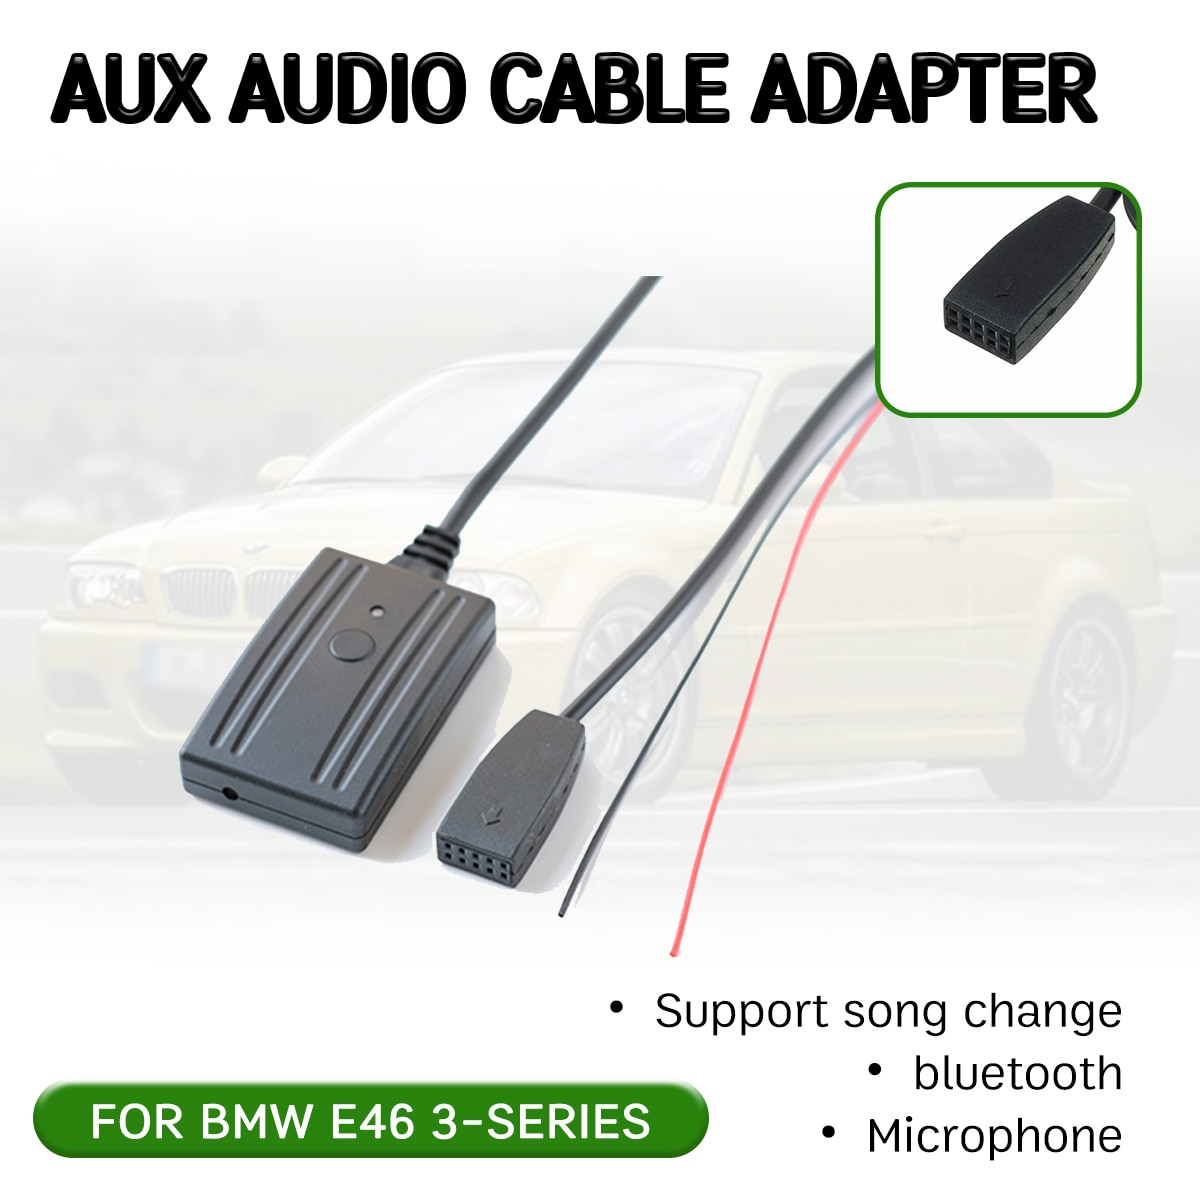 Adaptador de Cable receptor auxiliar bluetooth para BMW E46 2002-2006 módulo auxiliar Hifi manos libres para interfaz de Audio de unidad principal de CD de 10 pines